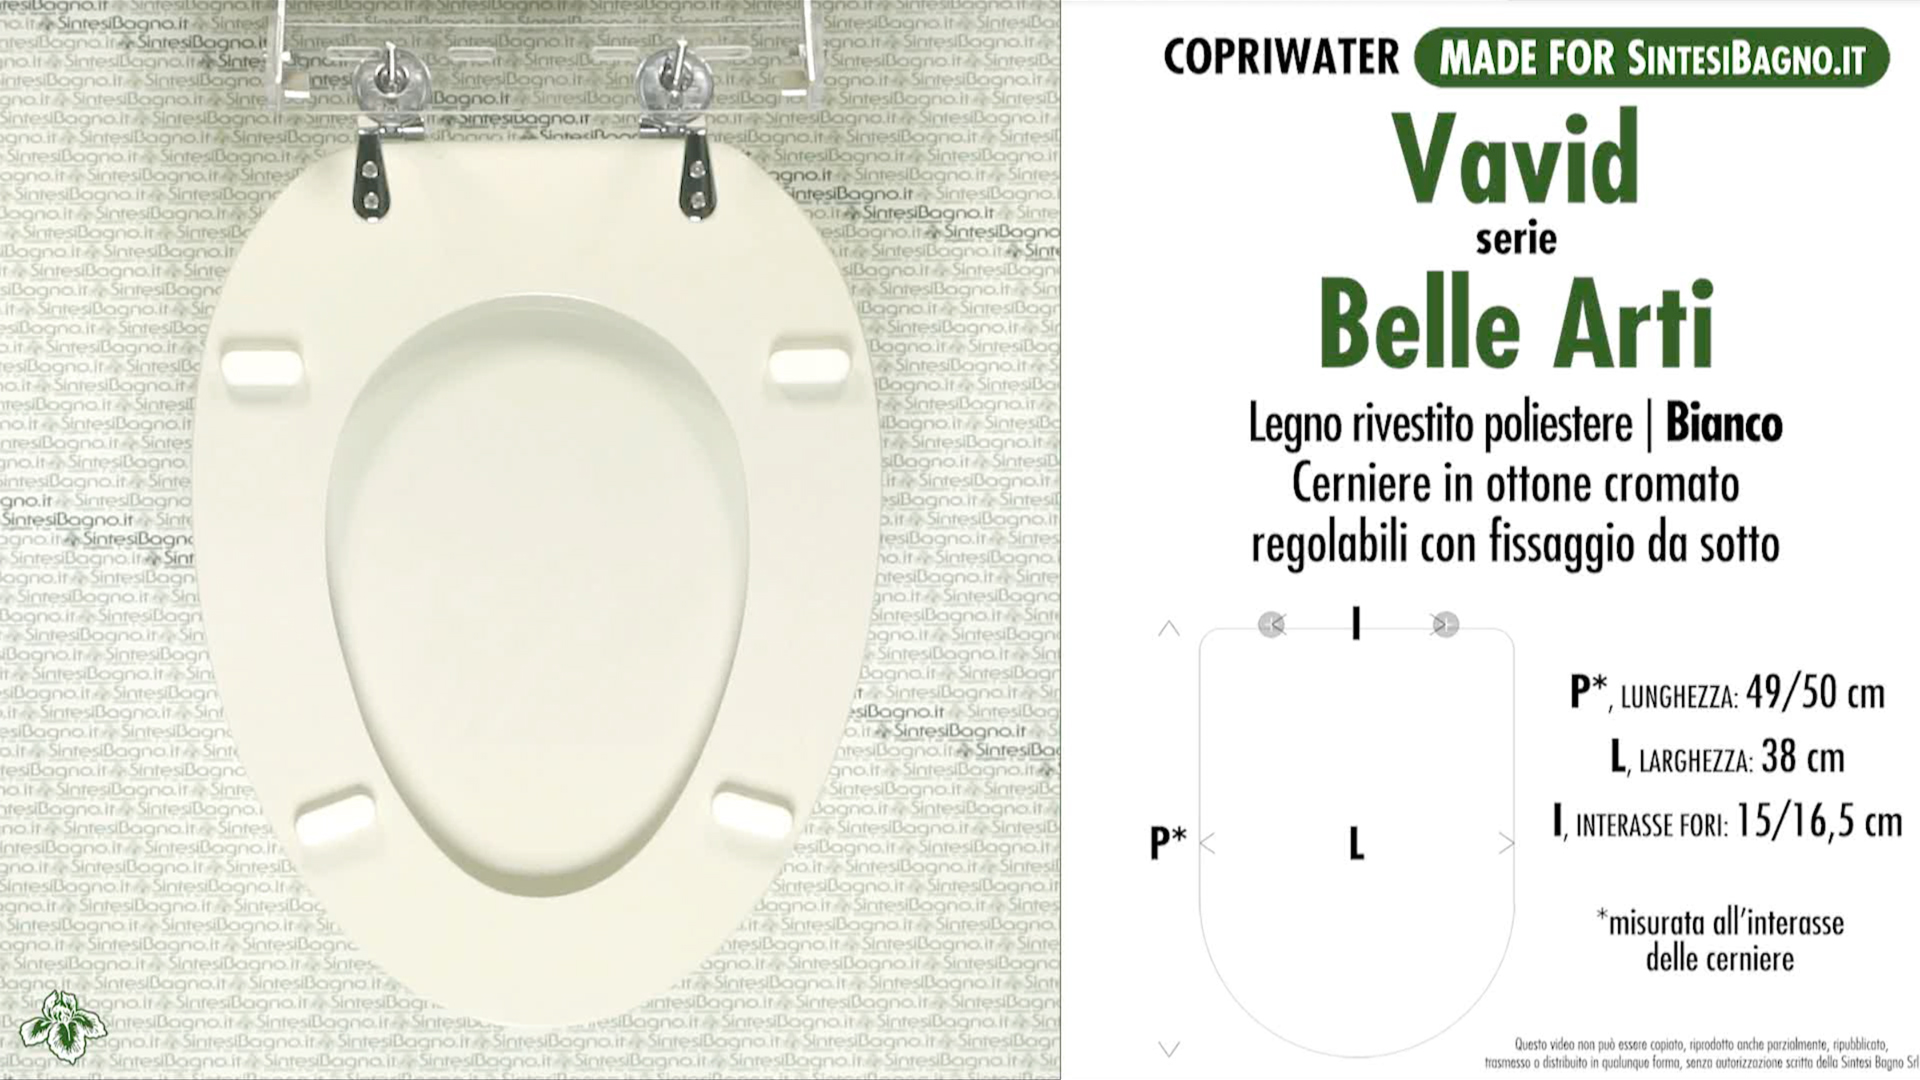 SCHEDA TECNICA MISURE copriwater VAVID BELLE ARTI